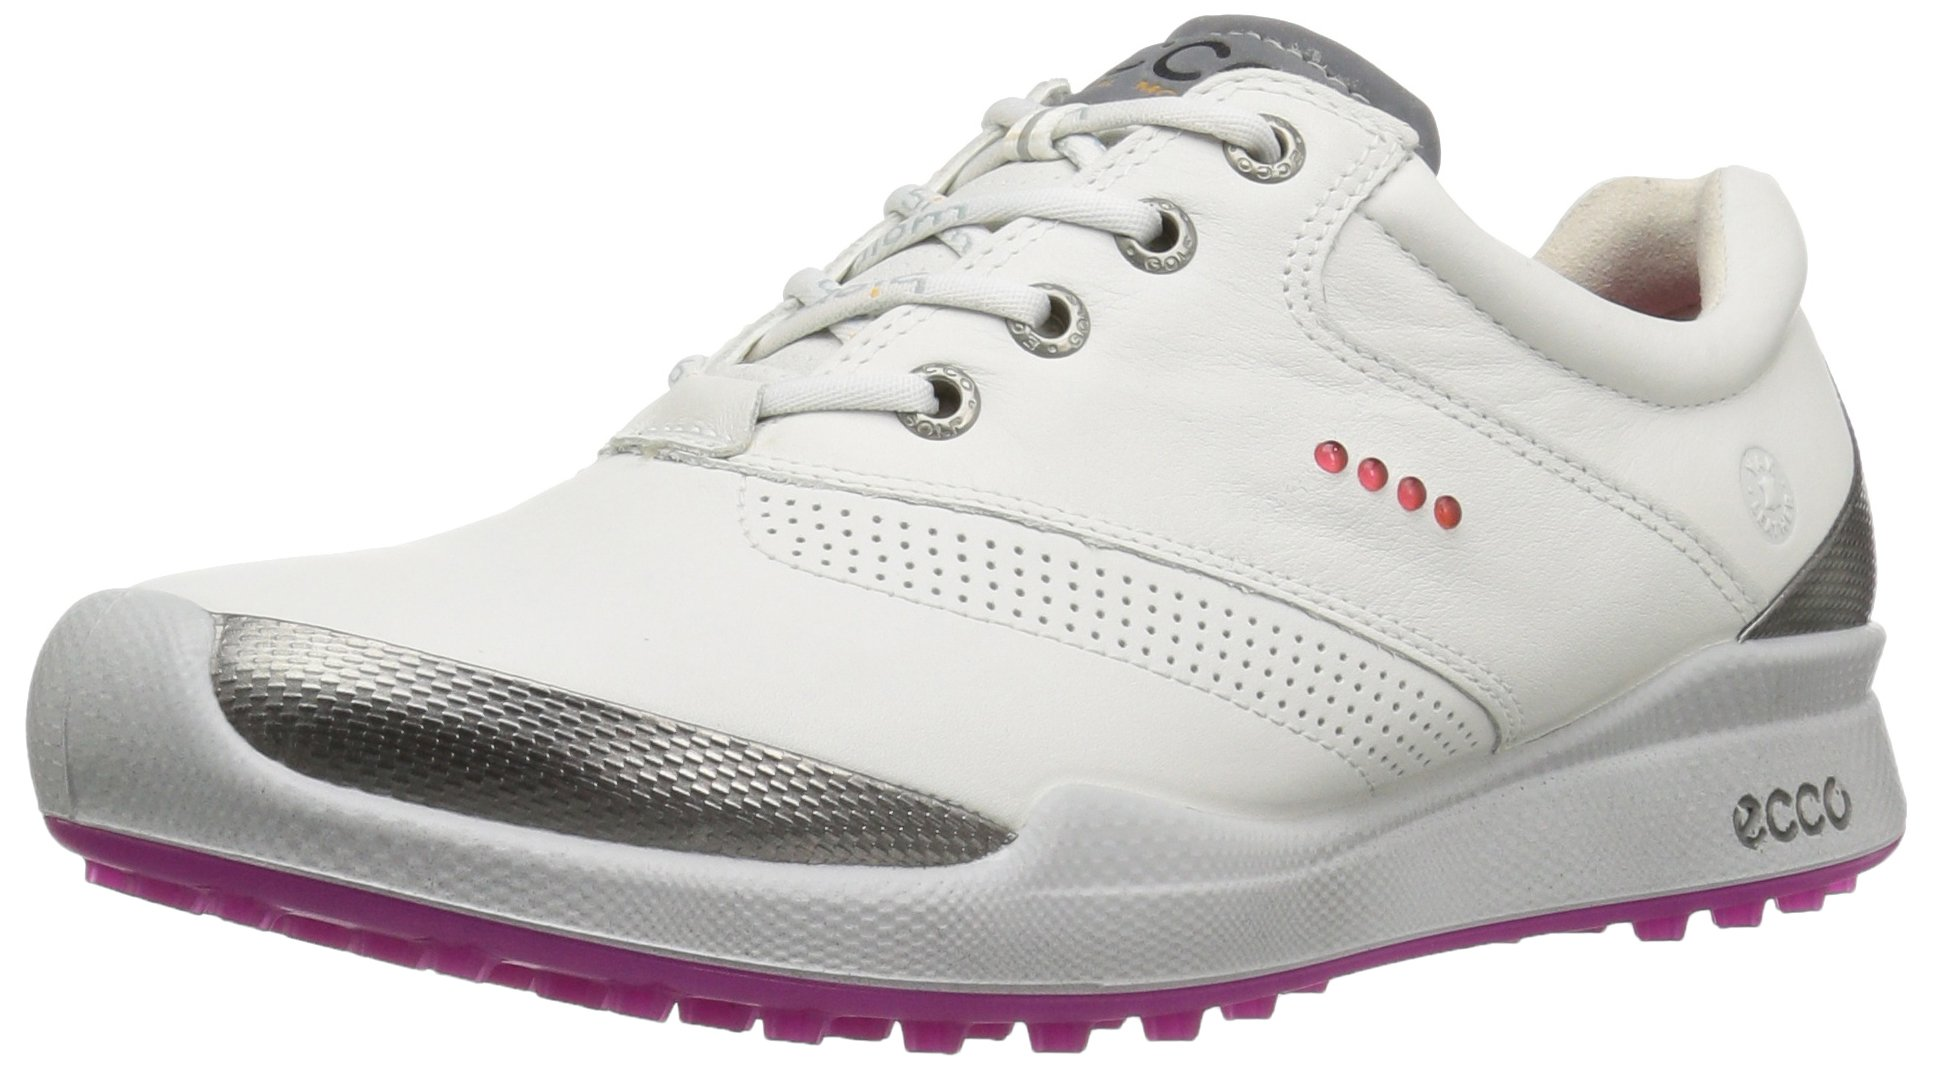 ECCO Women's Biom Hybrid Hydromax Golf Shoe, White/Candy, 39 EU/8-8.5 M US by ECCO (Image #1)